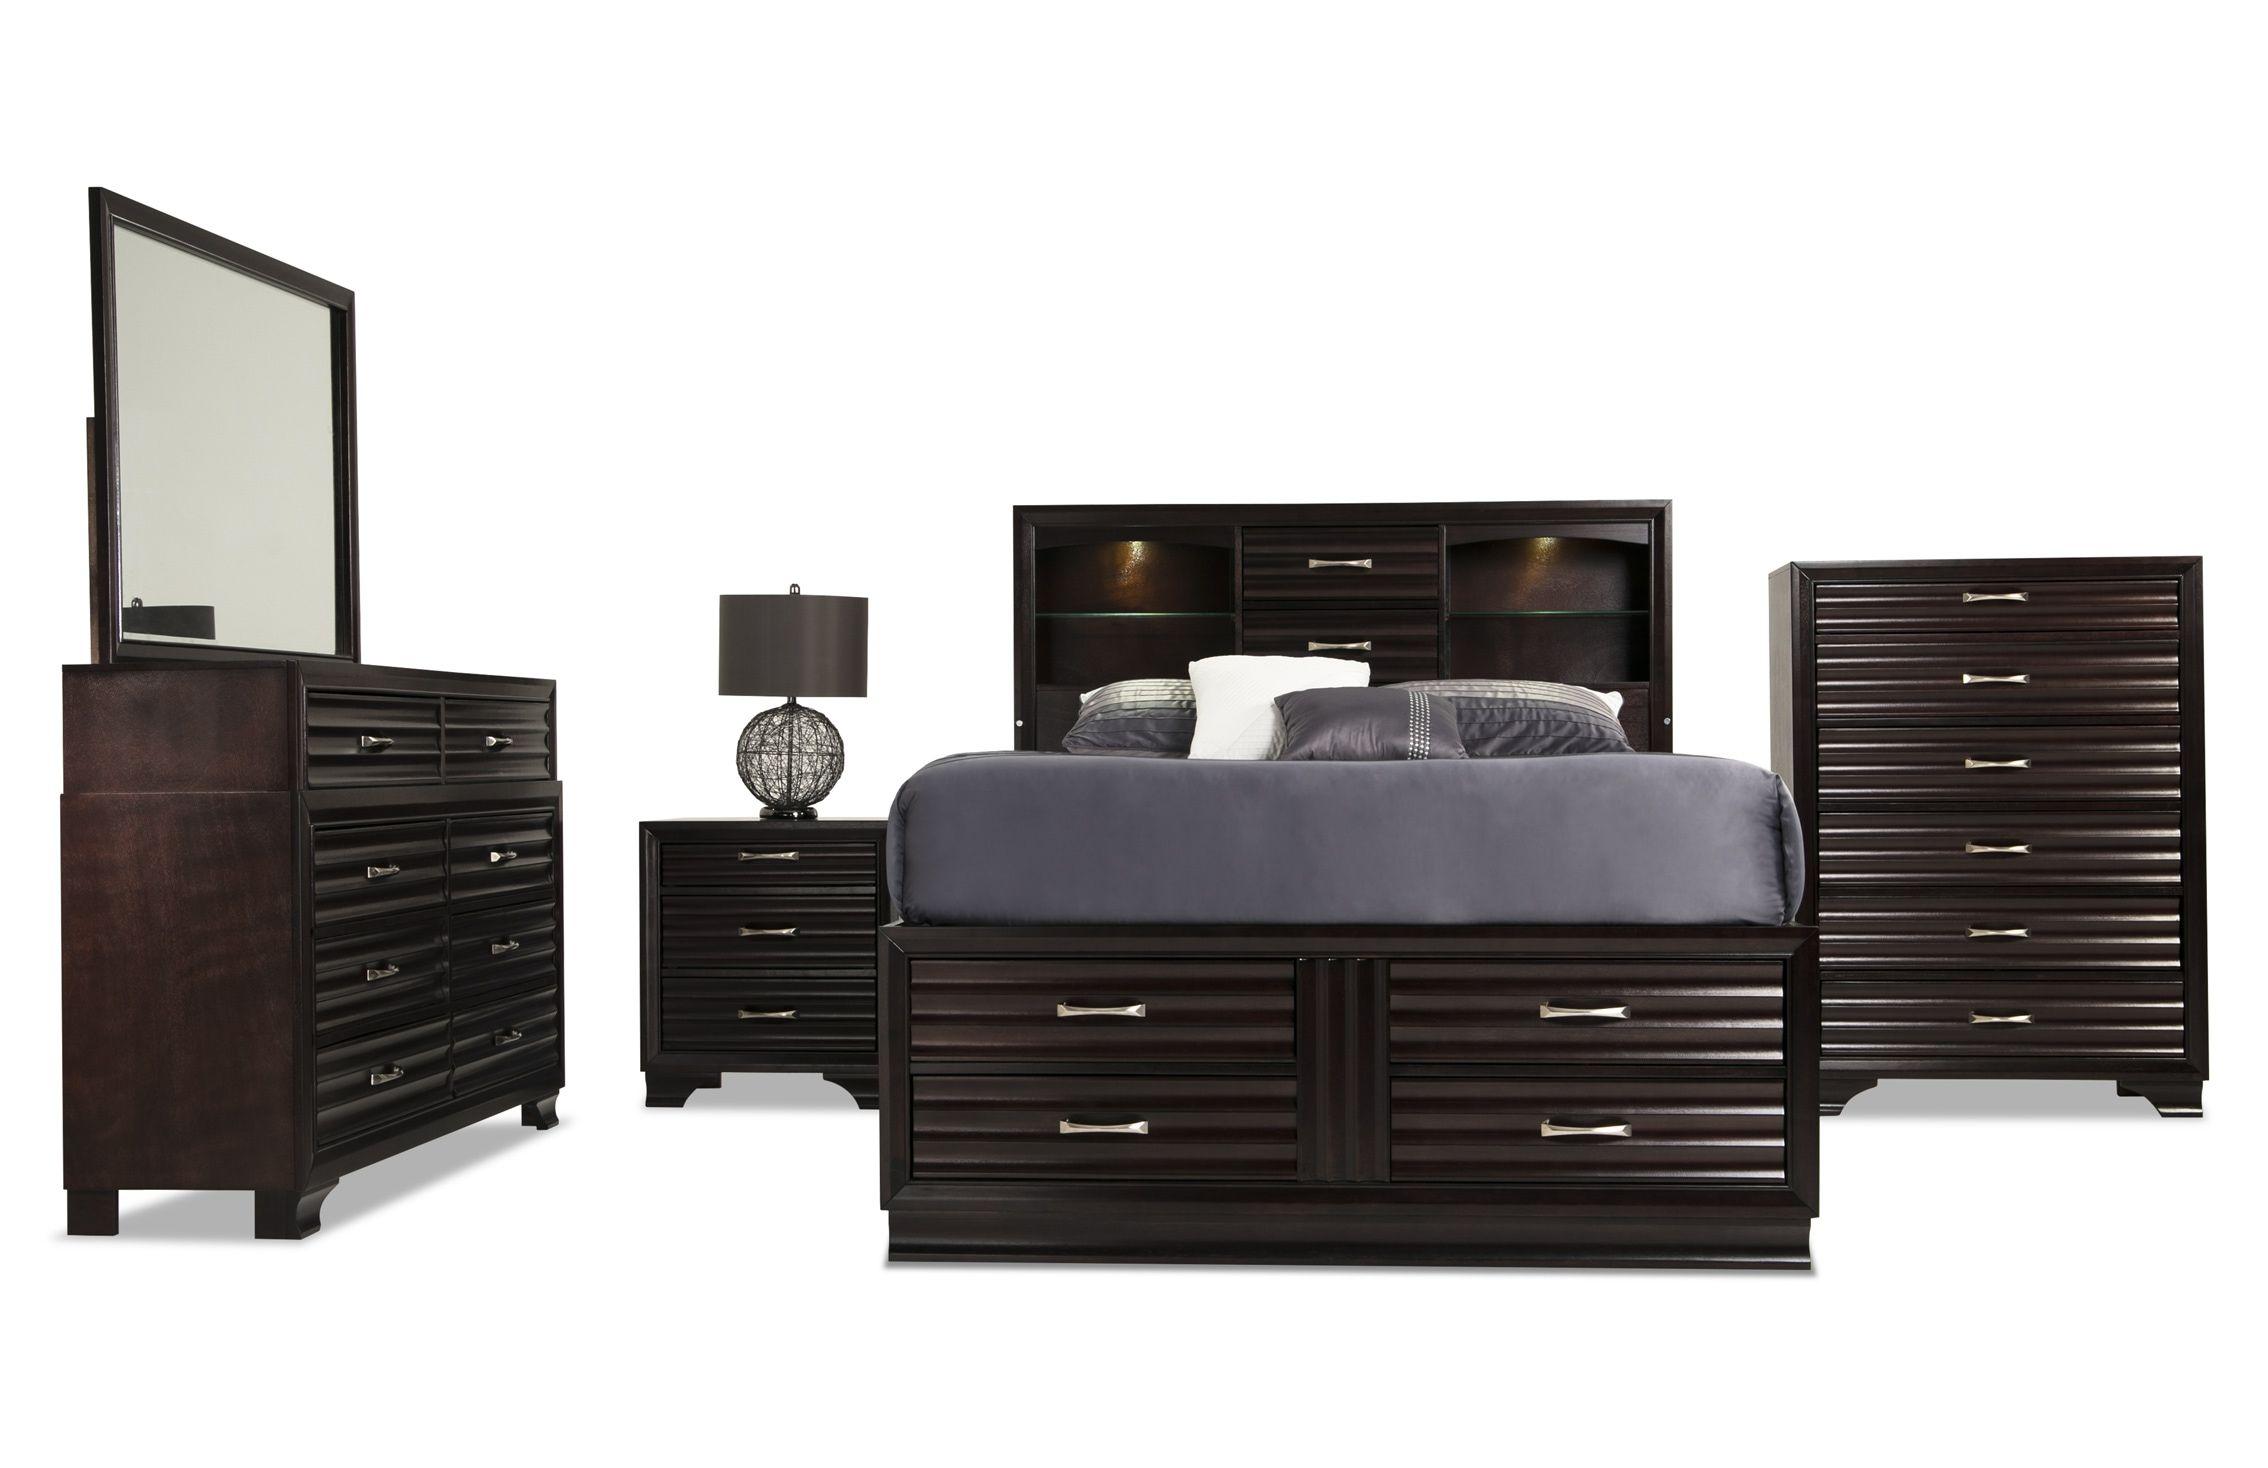 Midtown Storage Bedroom Set Storage Furniture Bedroom